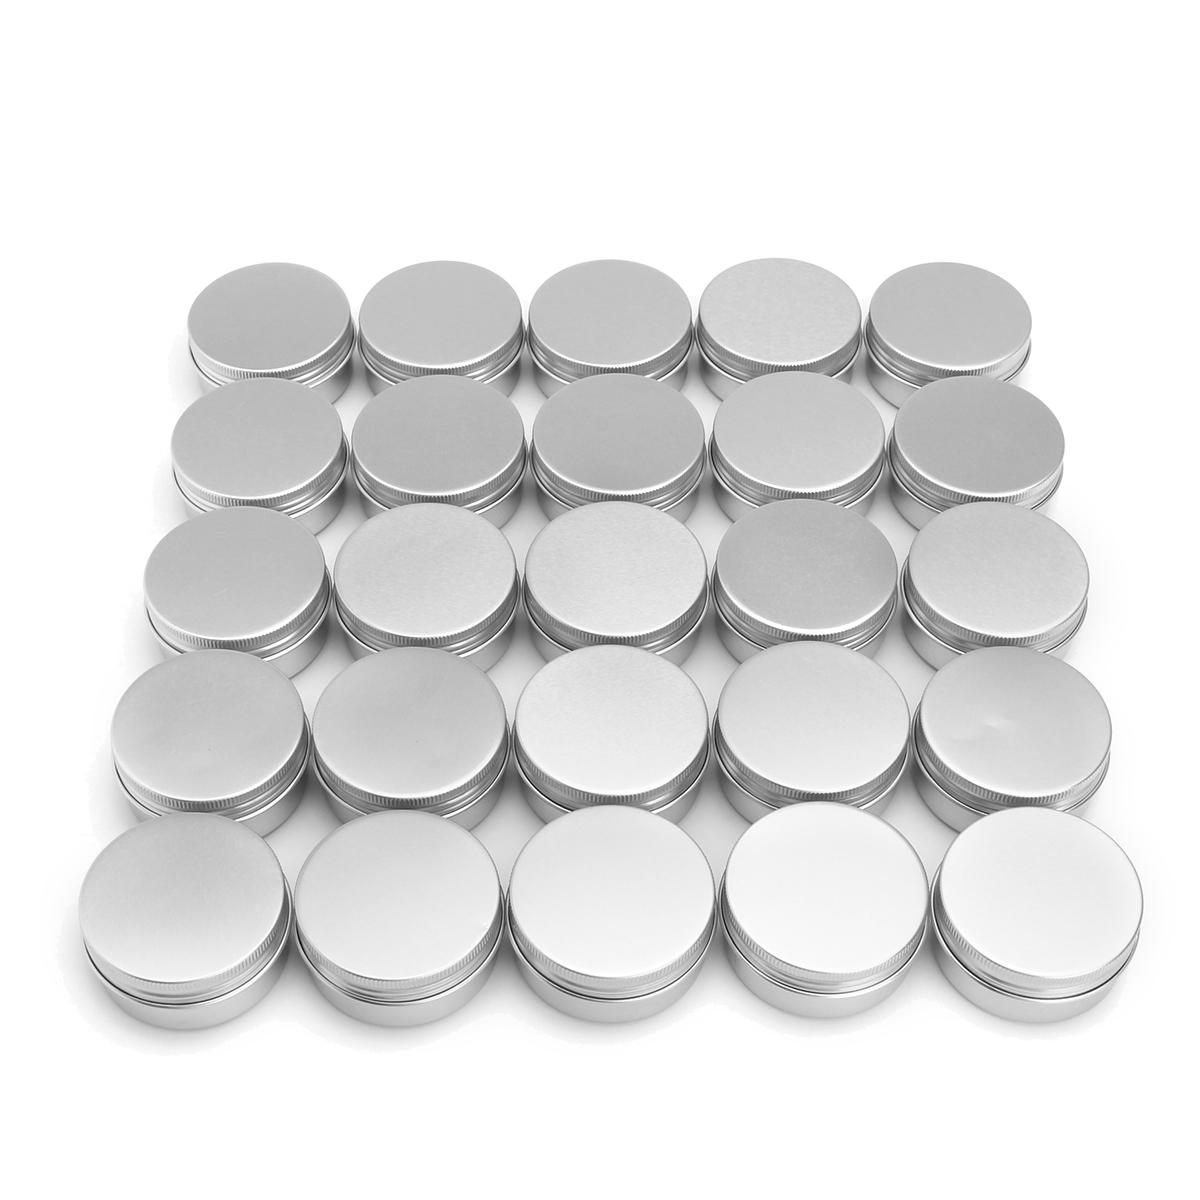 b534b82b9cd4 24Pcs 50G Aluminum Round Empty Jar Tin Screw Top Lid Cosmetic Sample  Storage Container